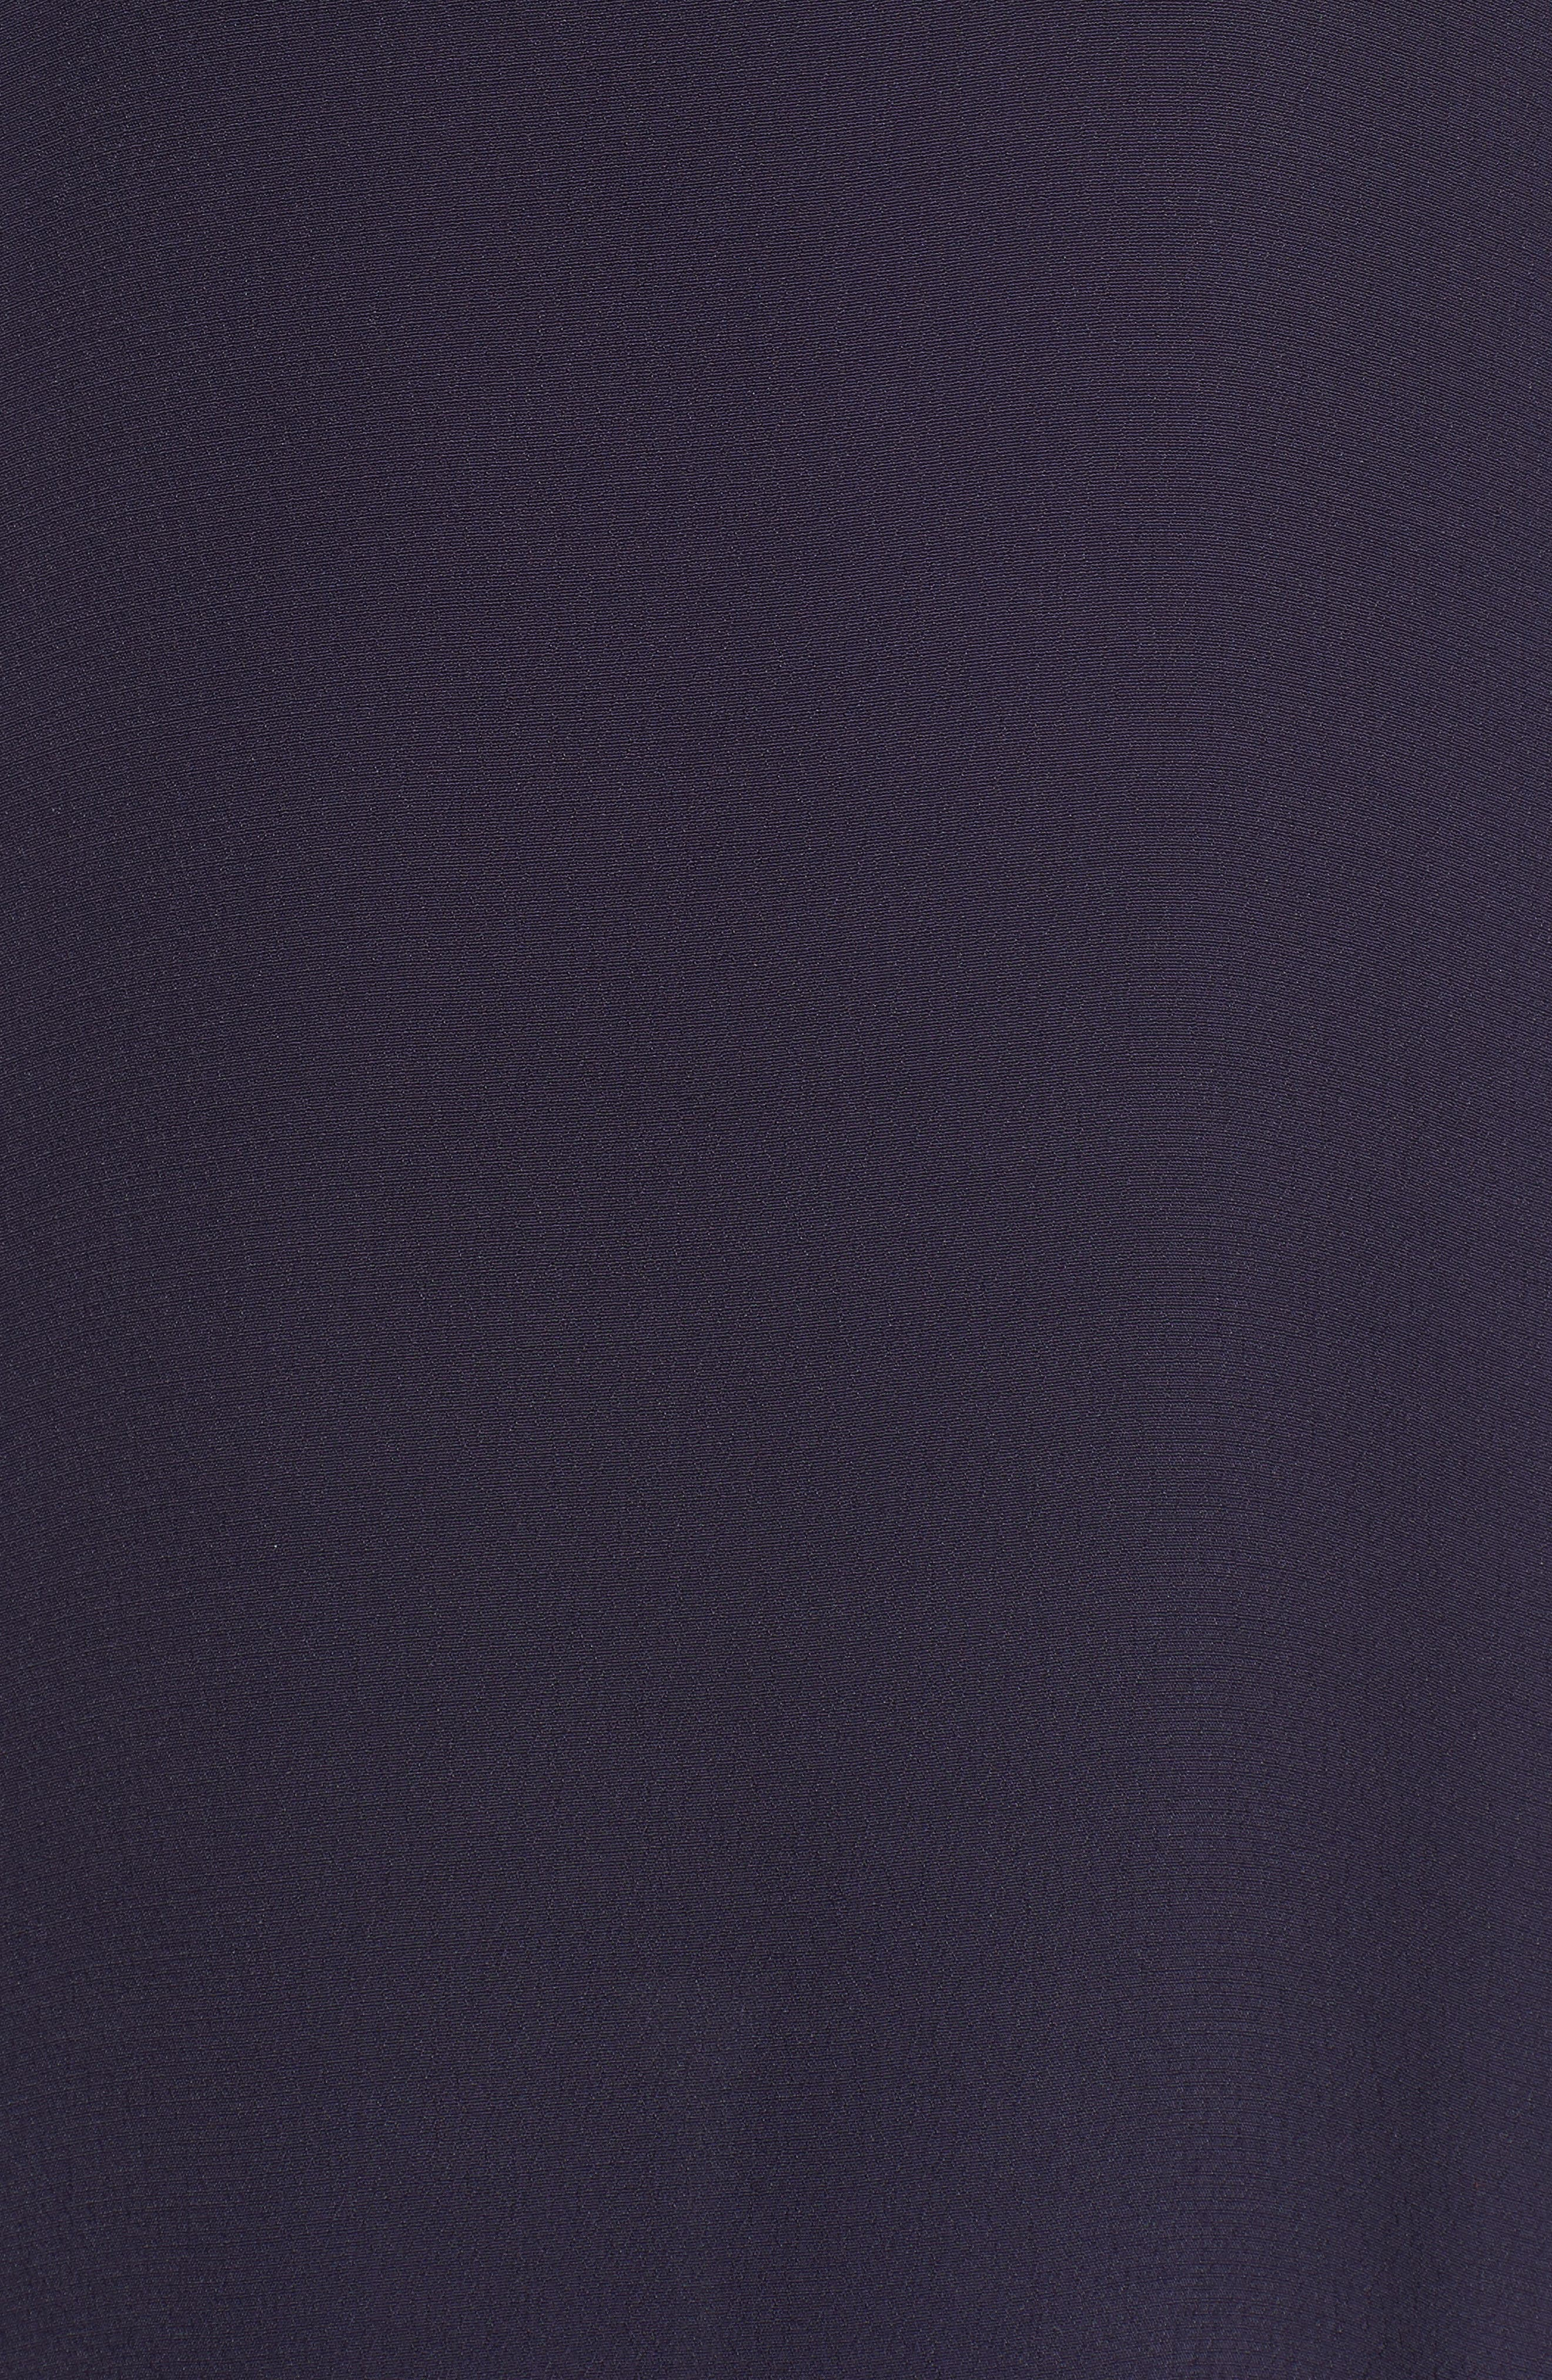 Maxi Dress,                             Alternate thumbnail 6, color,                             Navy